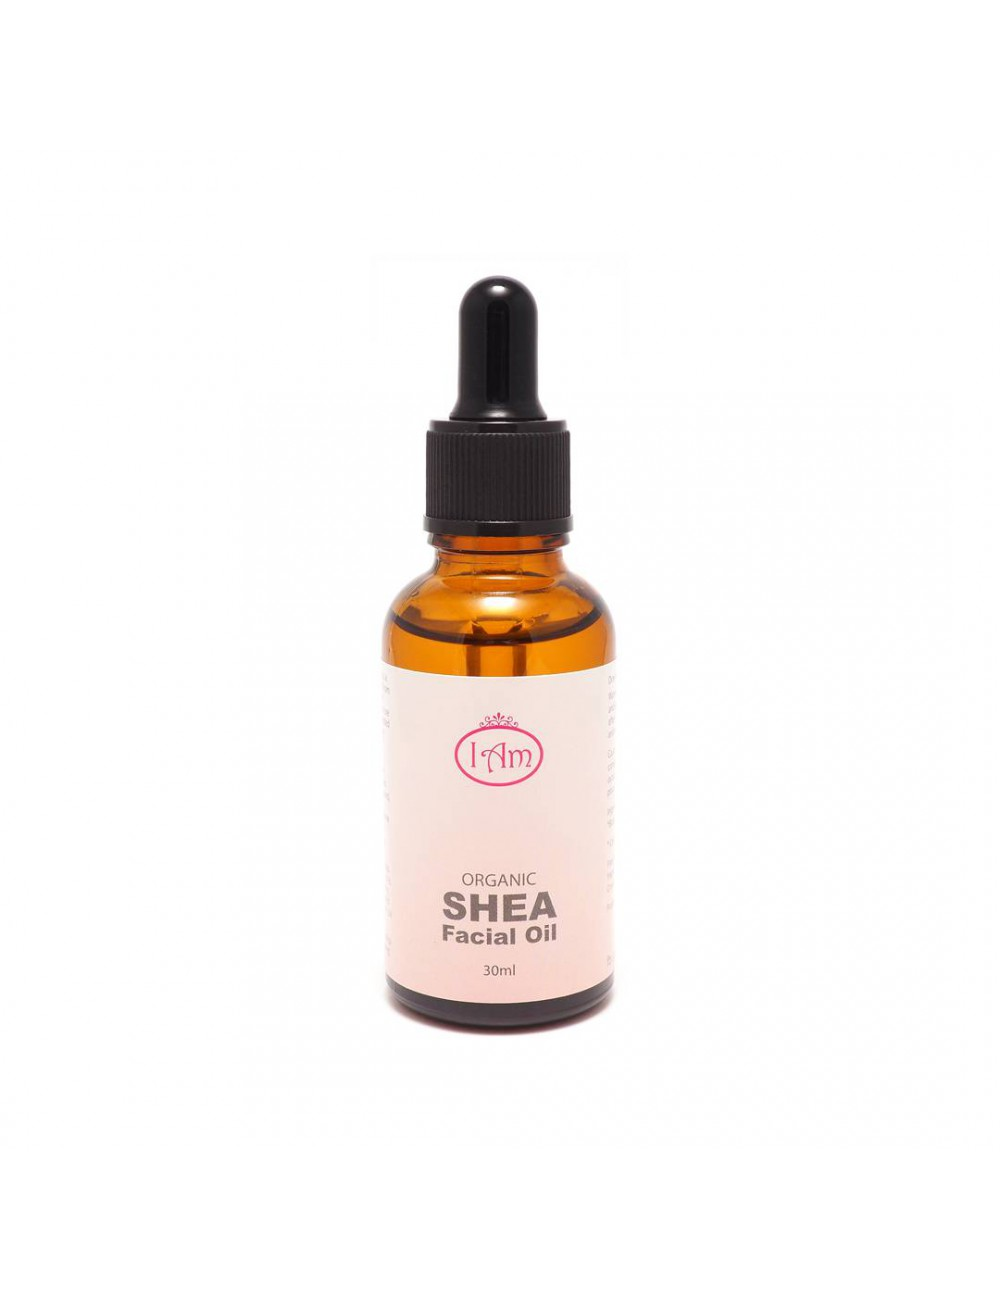 I AM Organic Shea Facial Oil 30ml